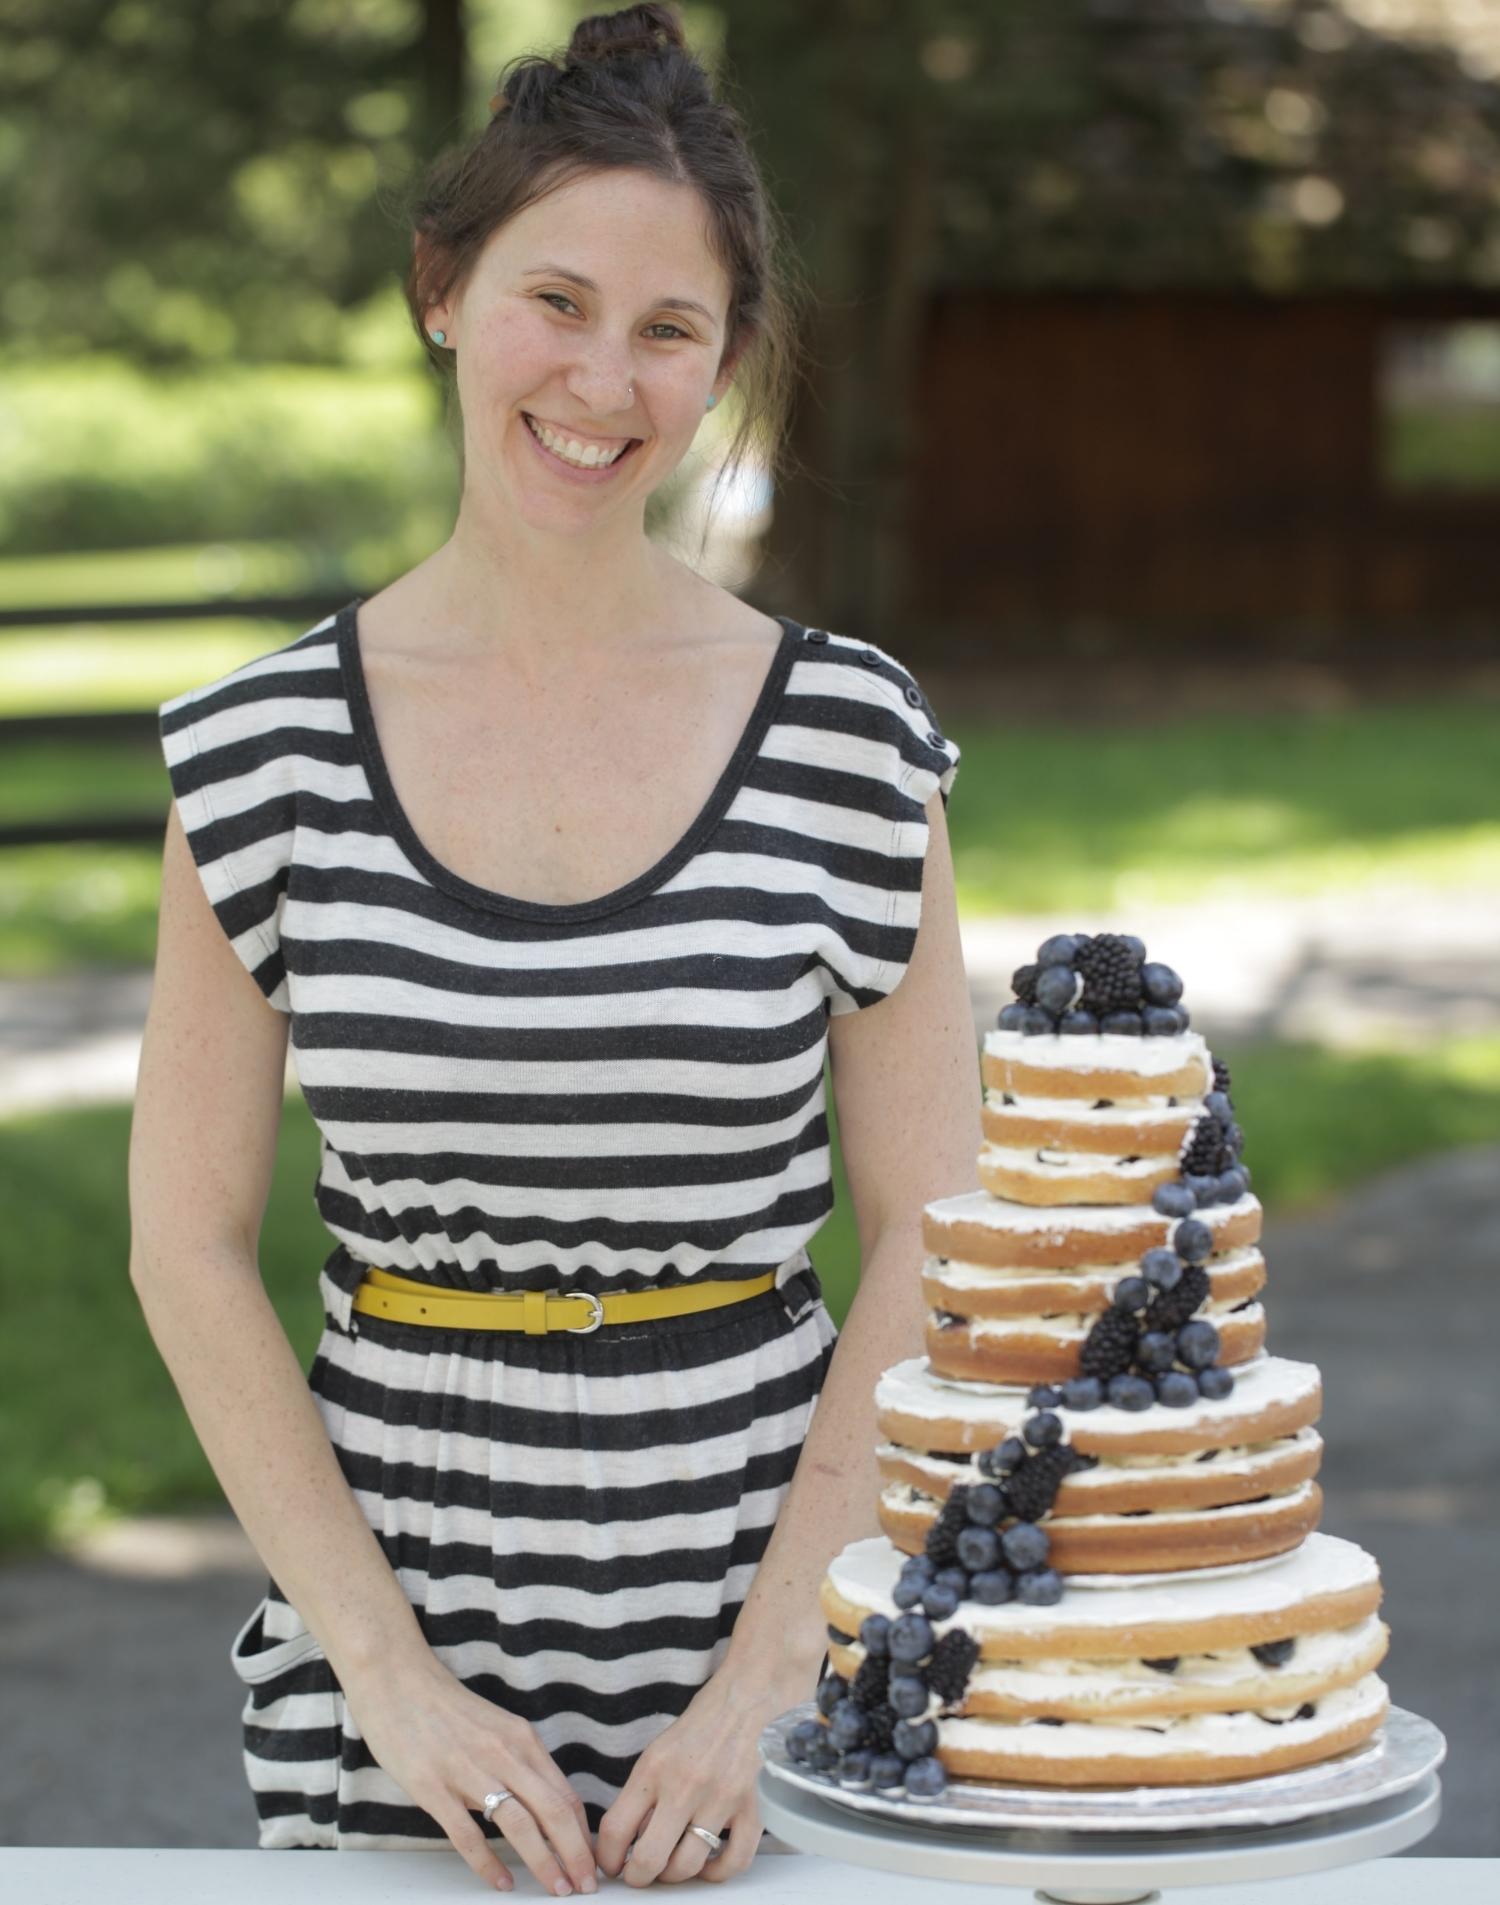 jen big smile with cake.jpg